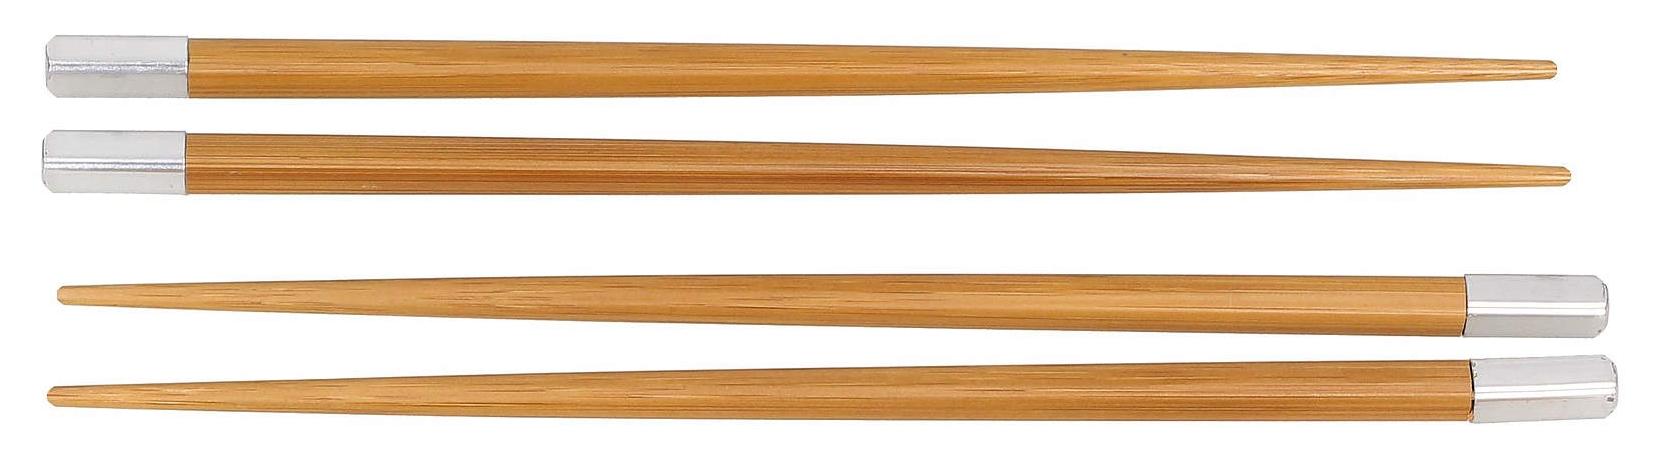 Pałeczki bambusowe do ryżu i sushi Typhoon Wood